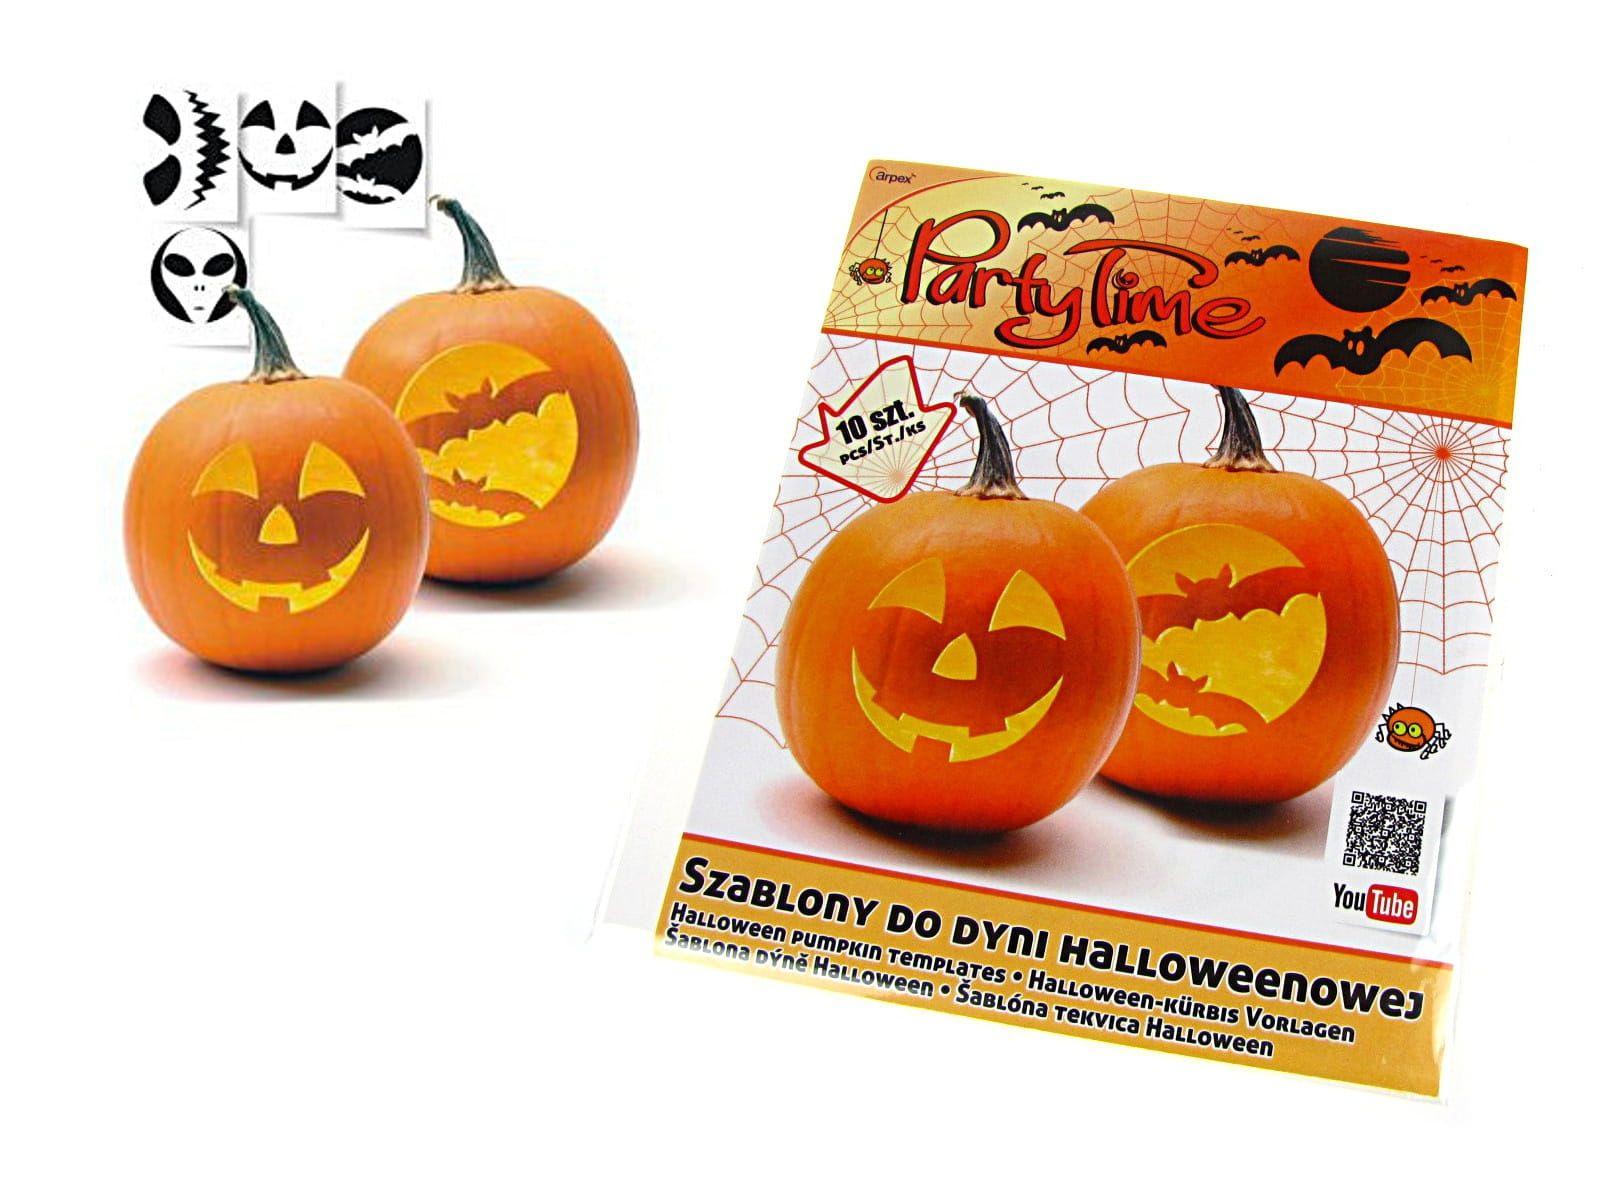 Szablony Do Dyni Halloween Pumpkins Pumpkin Carving Halloween